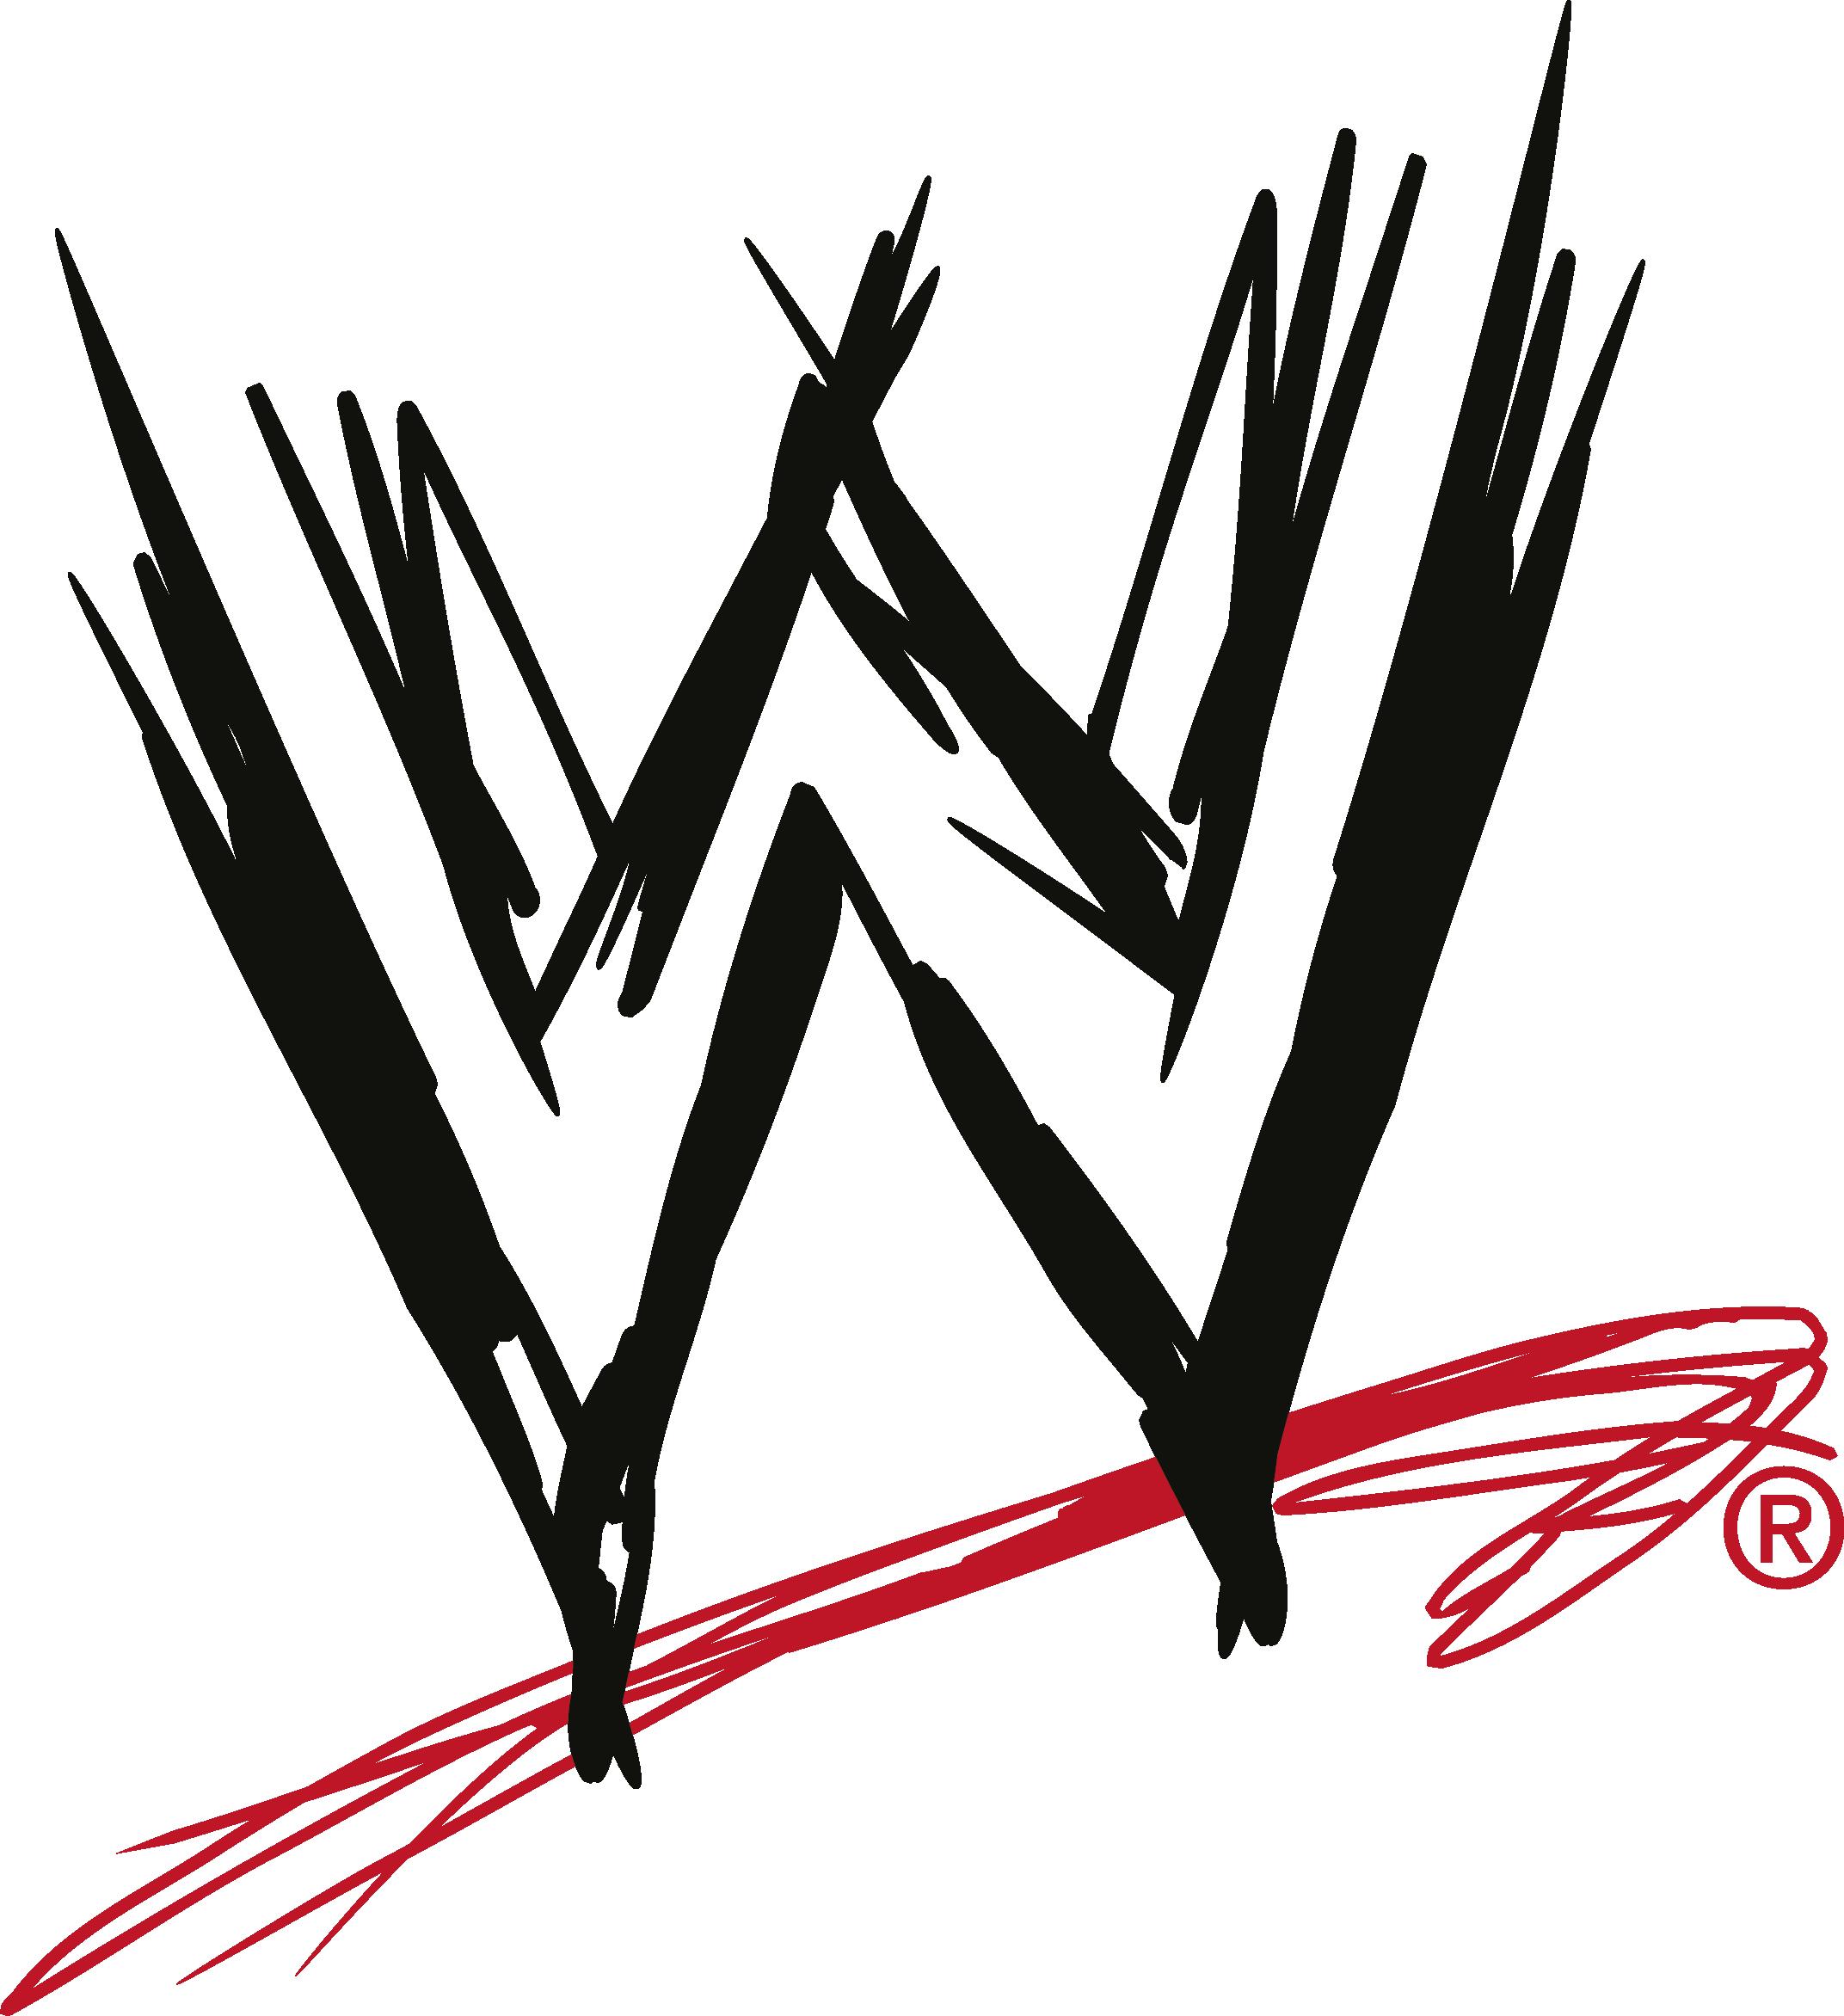 Wwe Logo World Wrestling Entertainment Wwe Logo Wwe Birthday Party Wrestling Birthday Parties